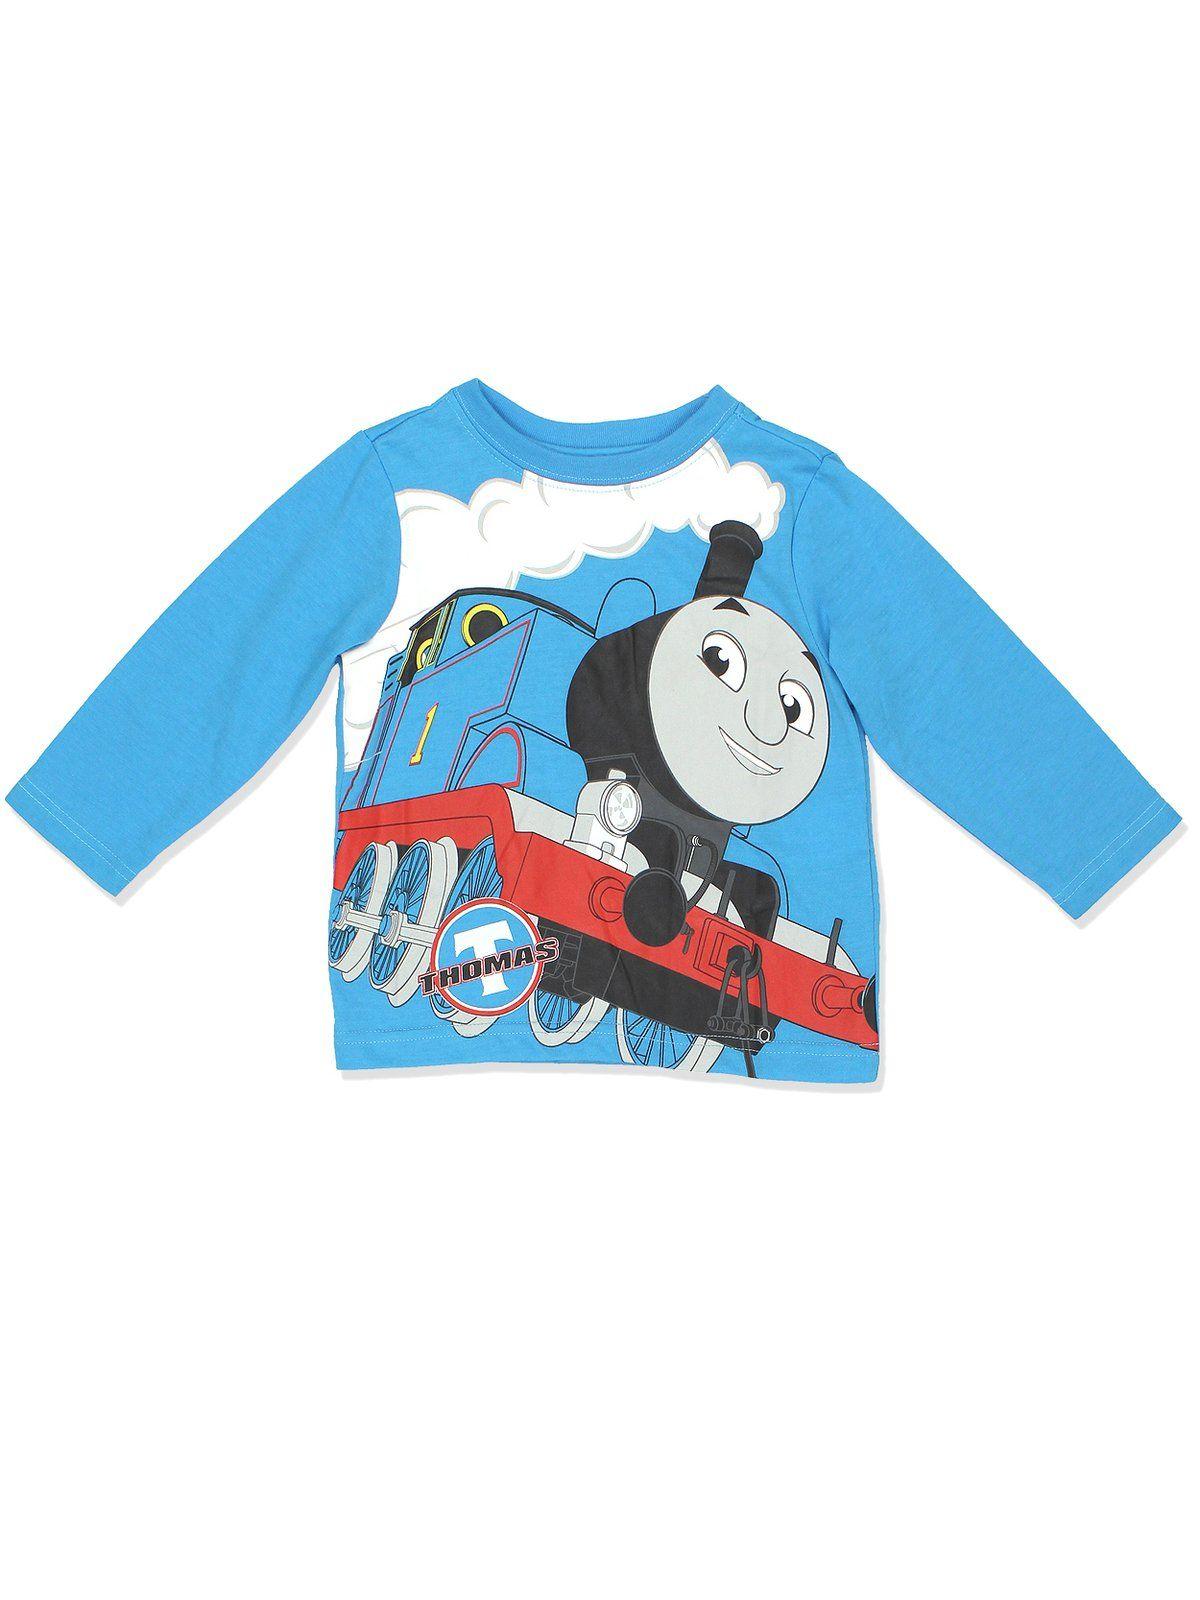 Boy/'s Thomas /& Friends Toddler 3 Piece Pajama Set Top Shorts Pants 3T New